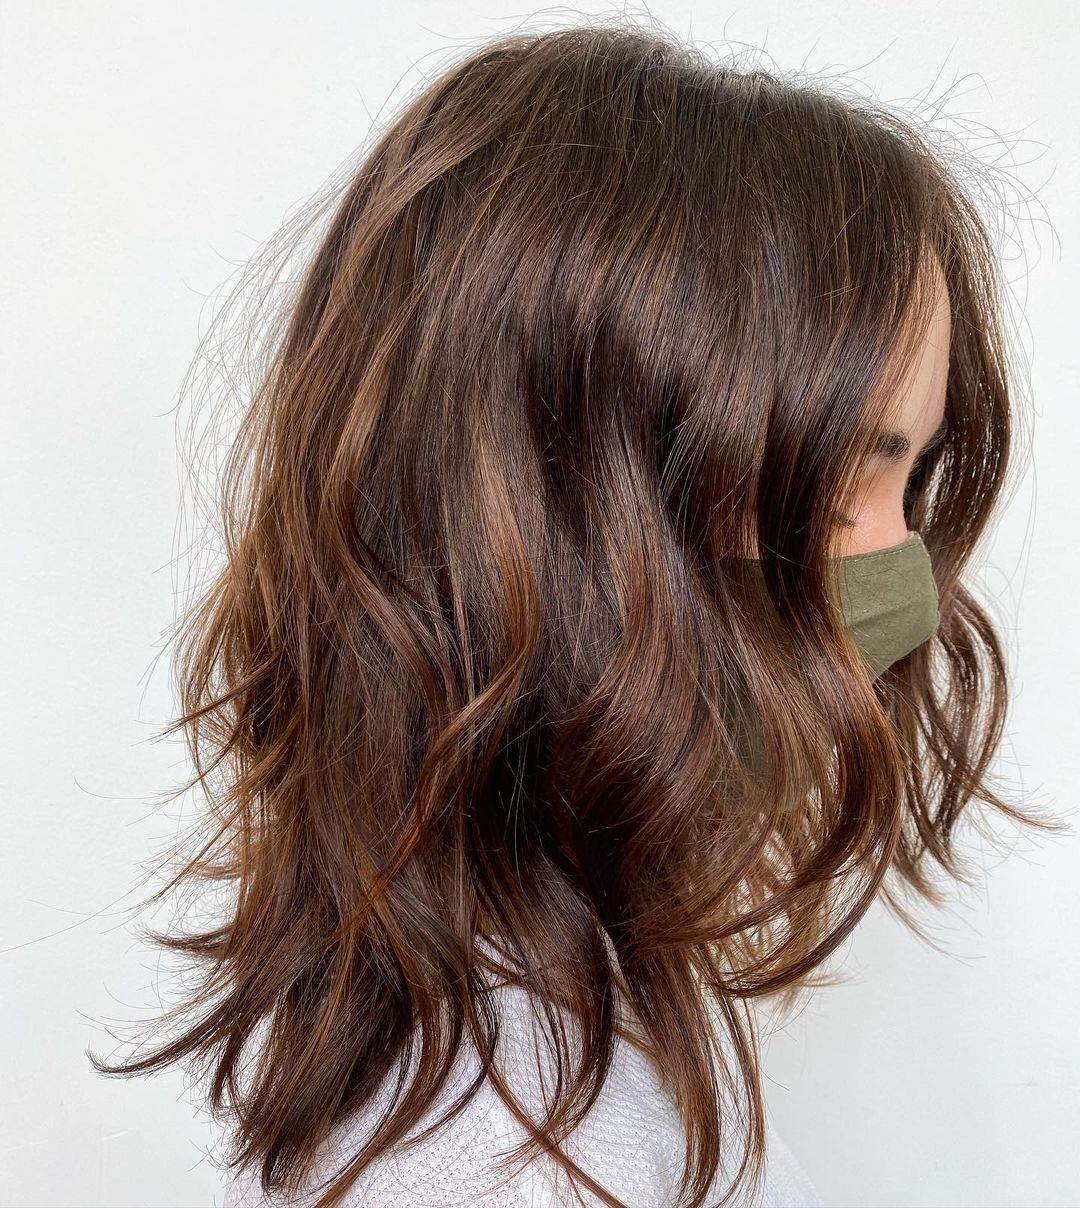 Lovely Female Haircut for Medium Hair